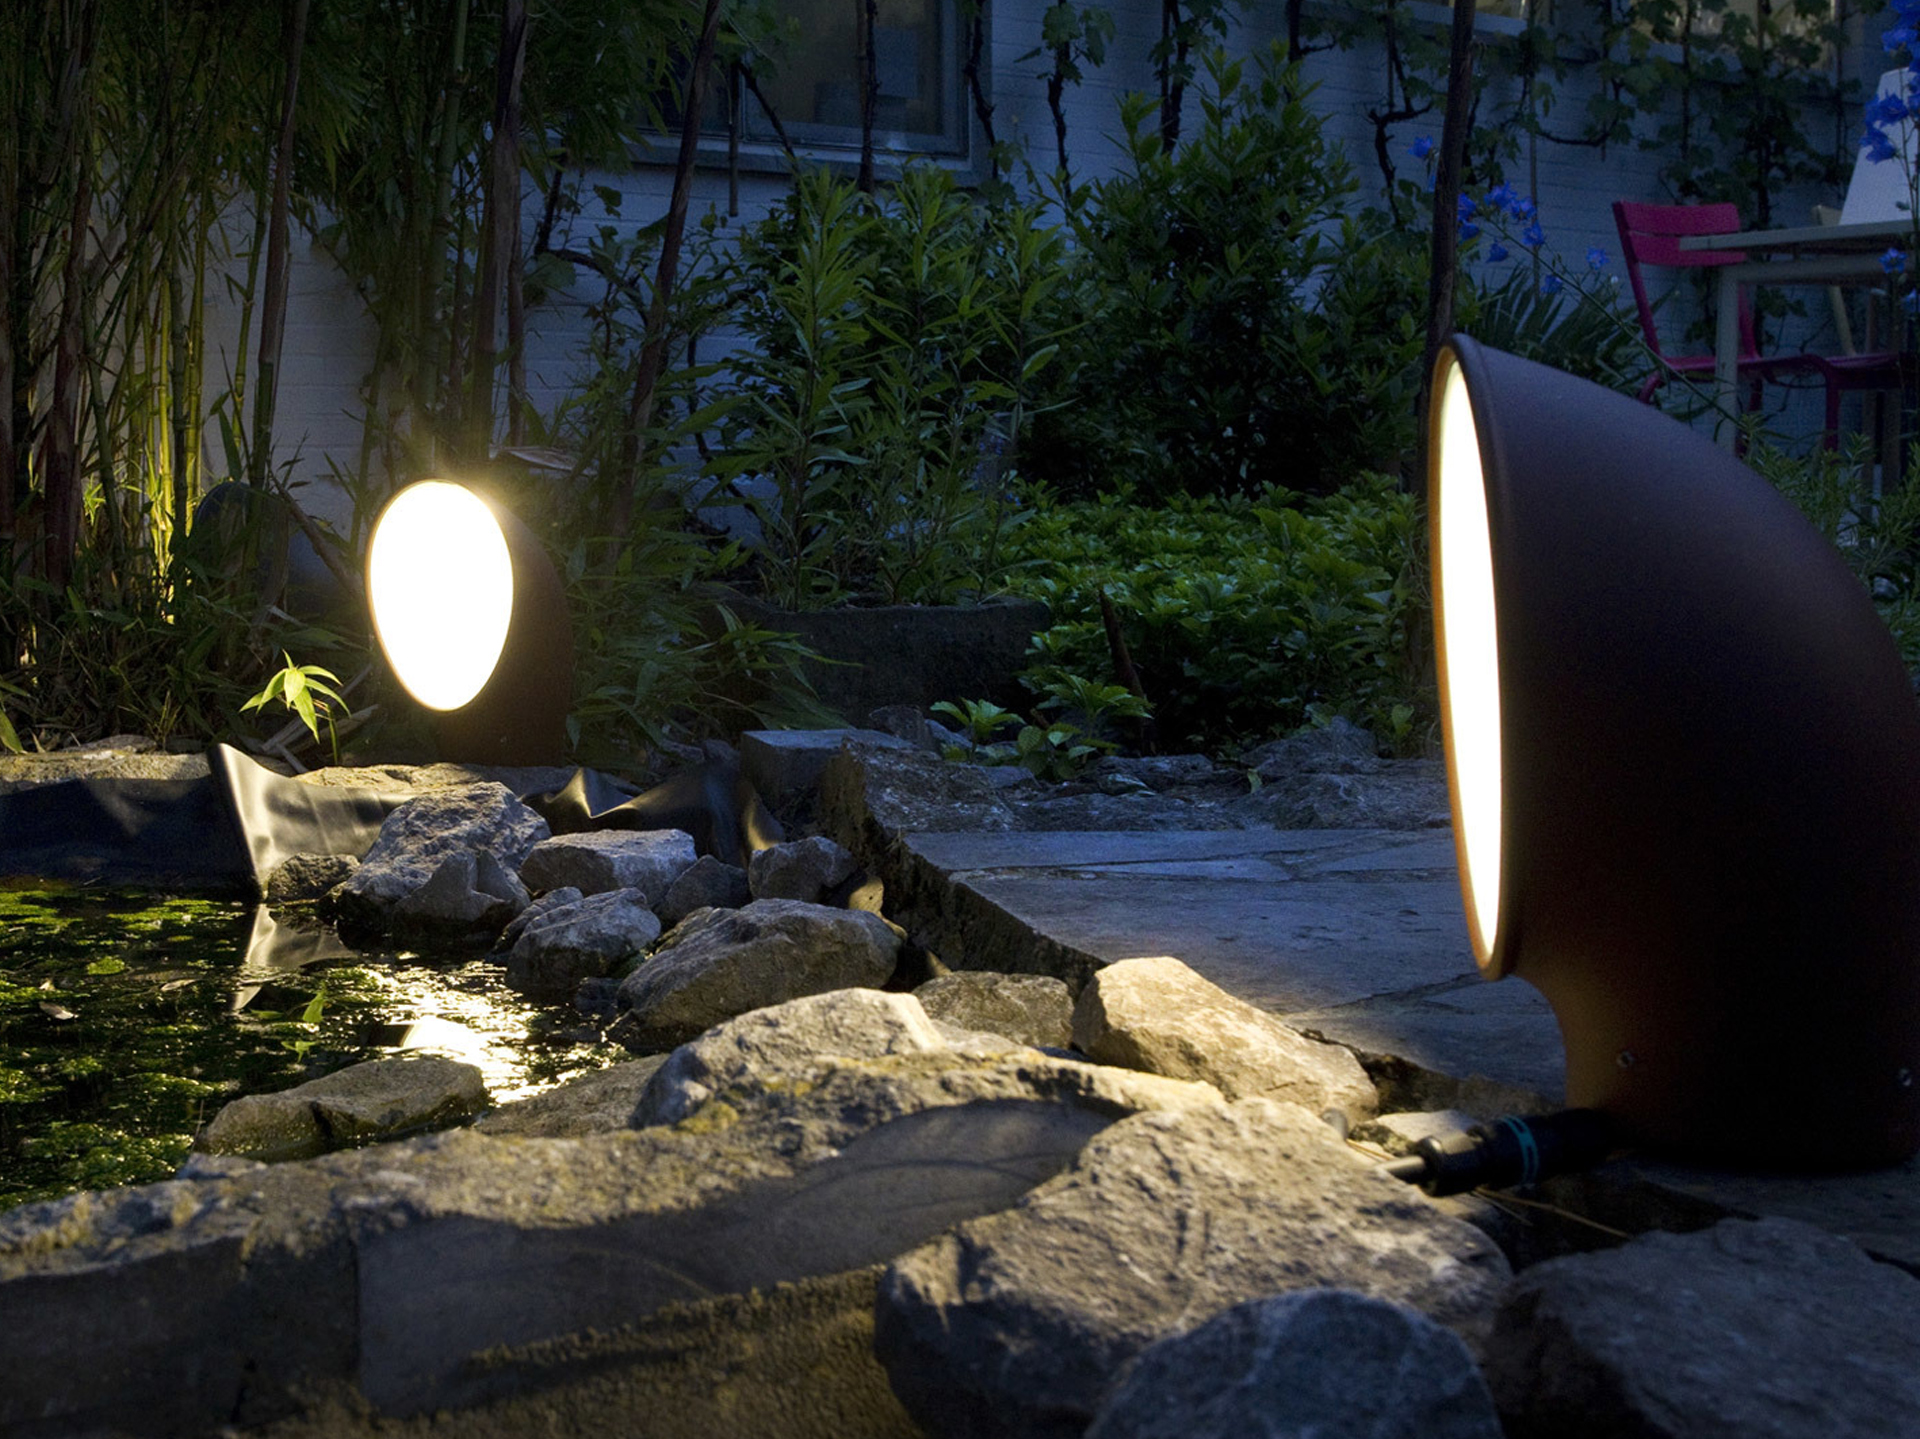 Lightfactory_artemide_piroscafo_outdoor_april_2019